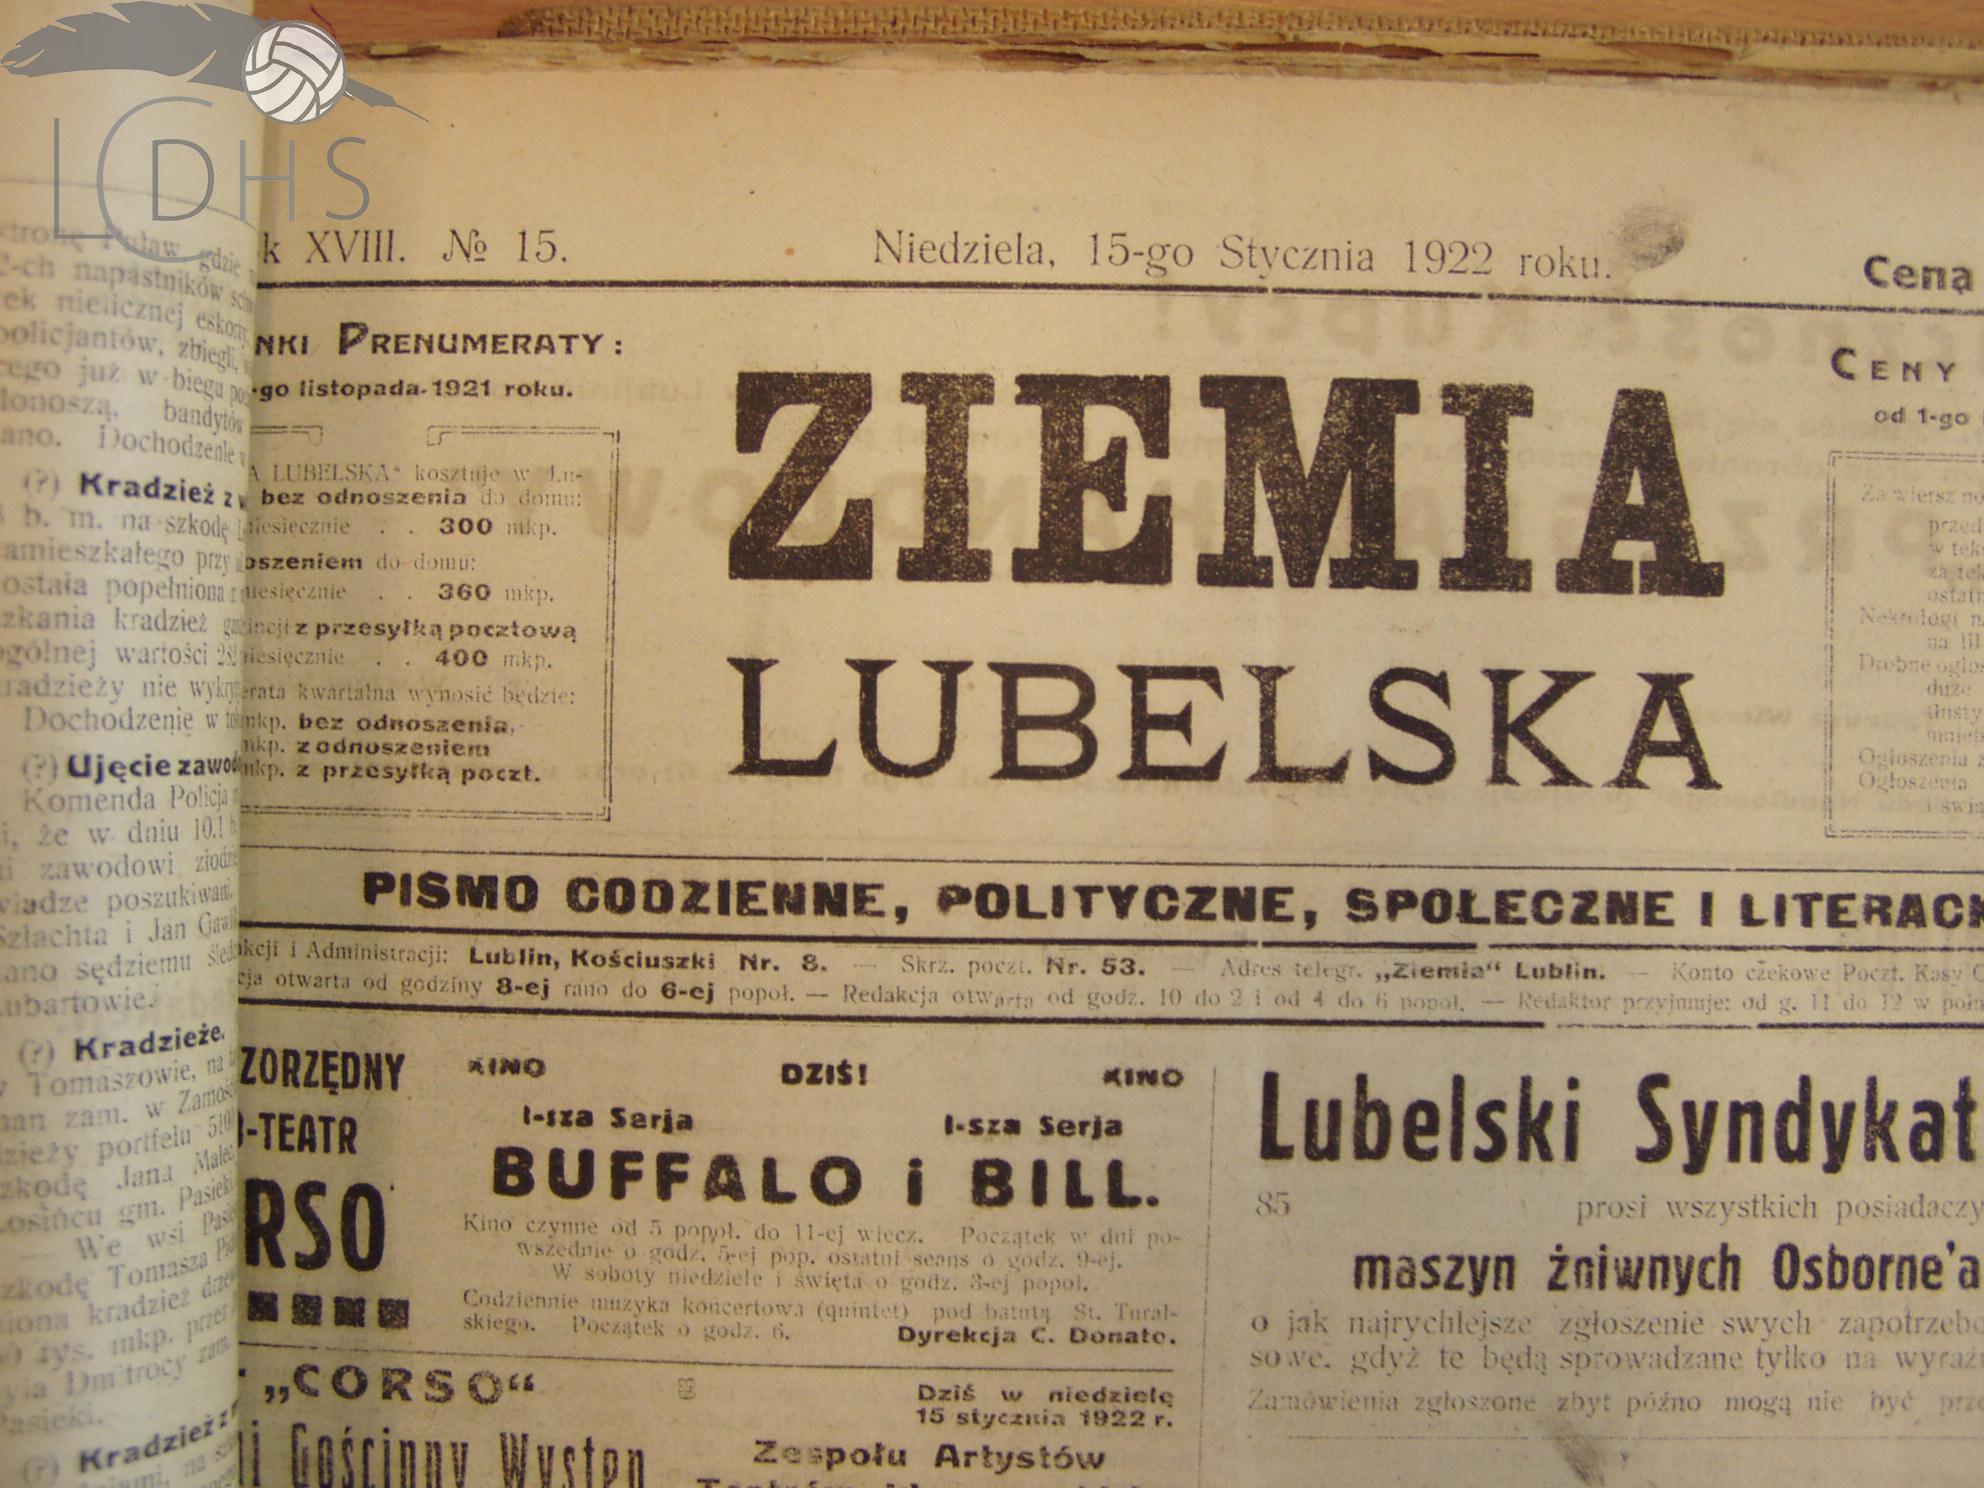 Ziemia Lubelska 15 I 1922